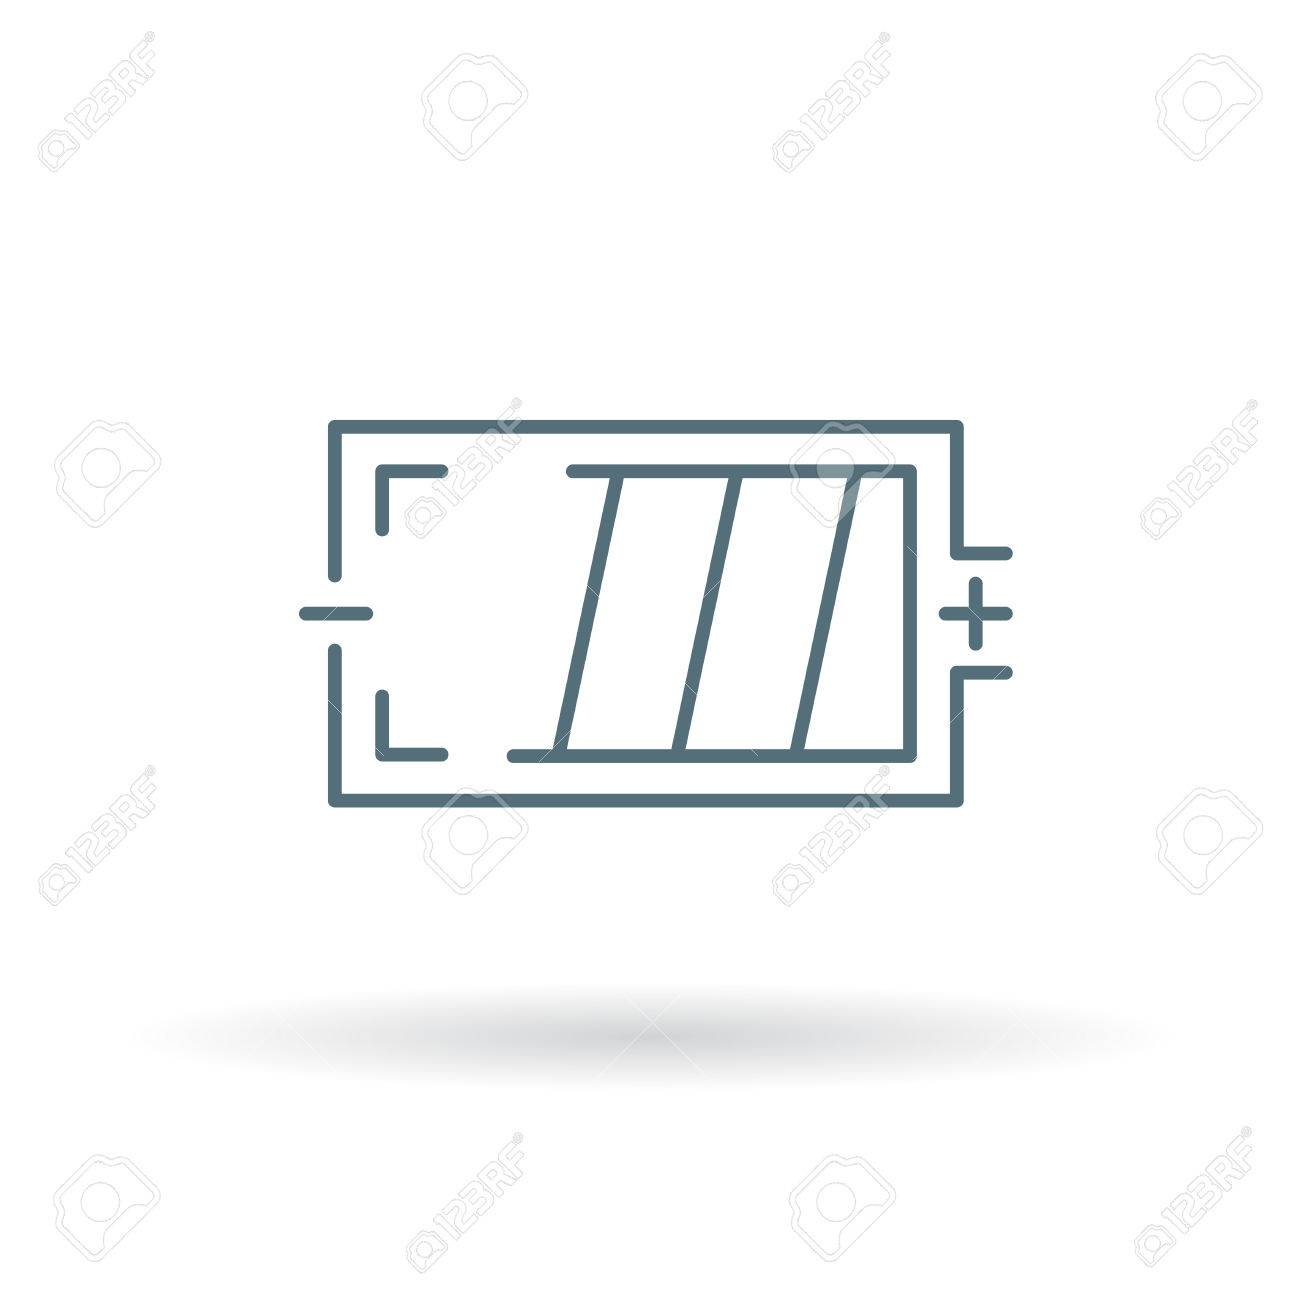 Unique Cell Symbol Picture Collection - Electrical Diagram Ideas ...